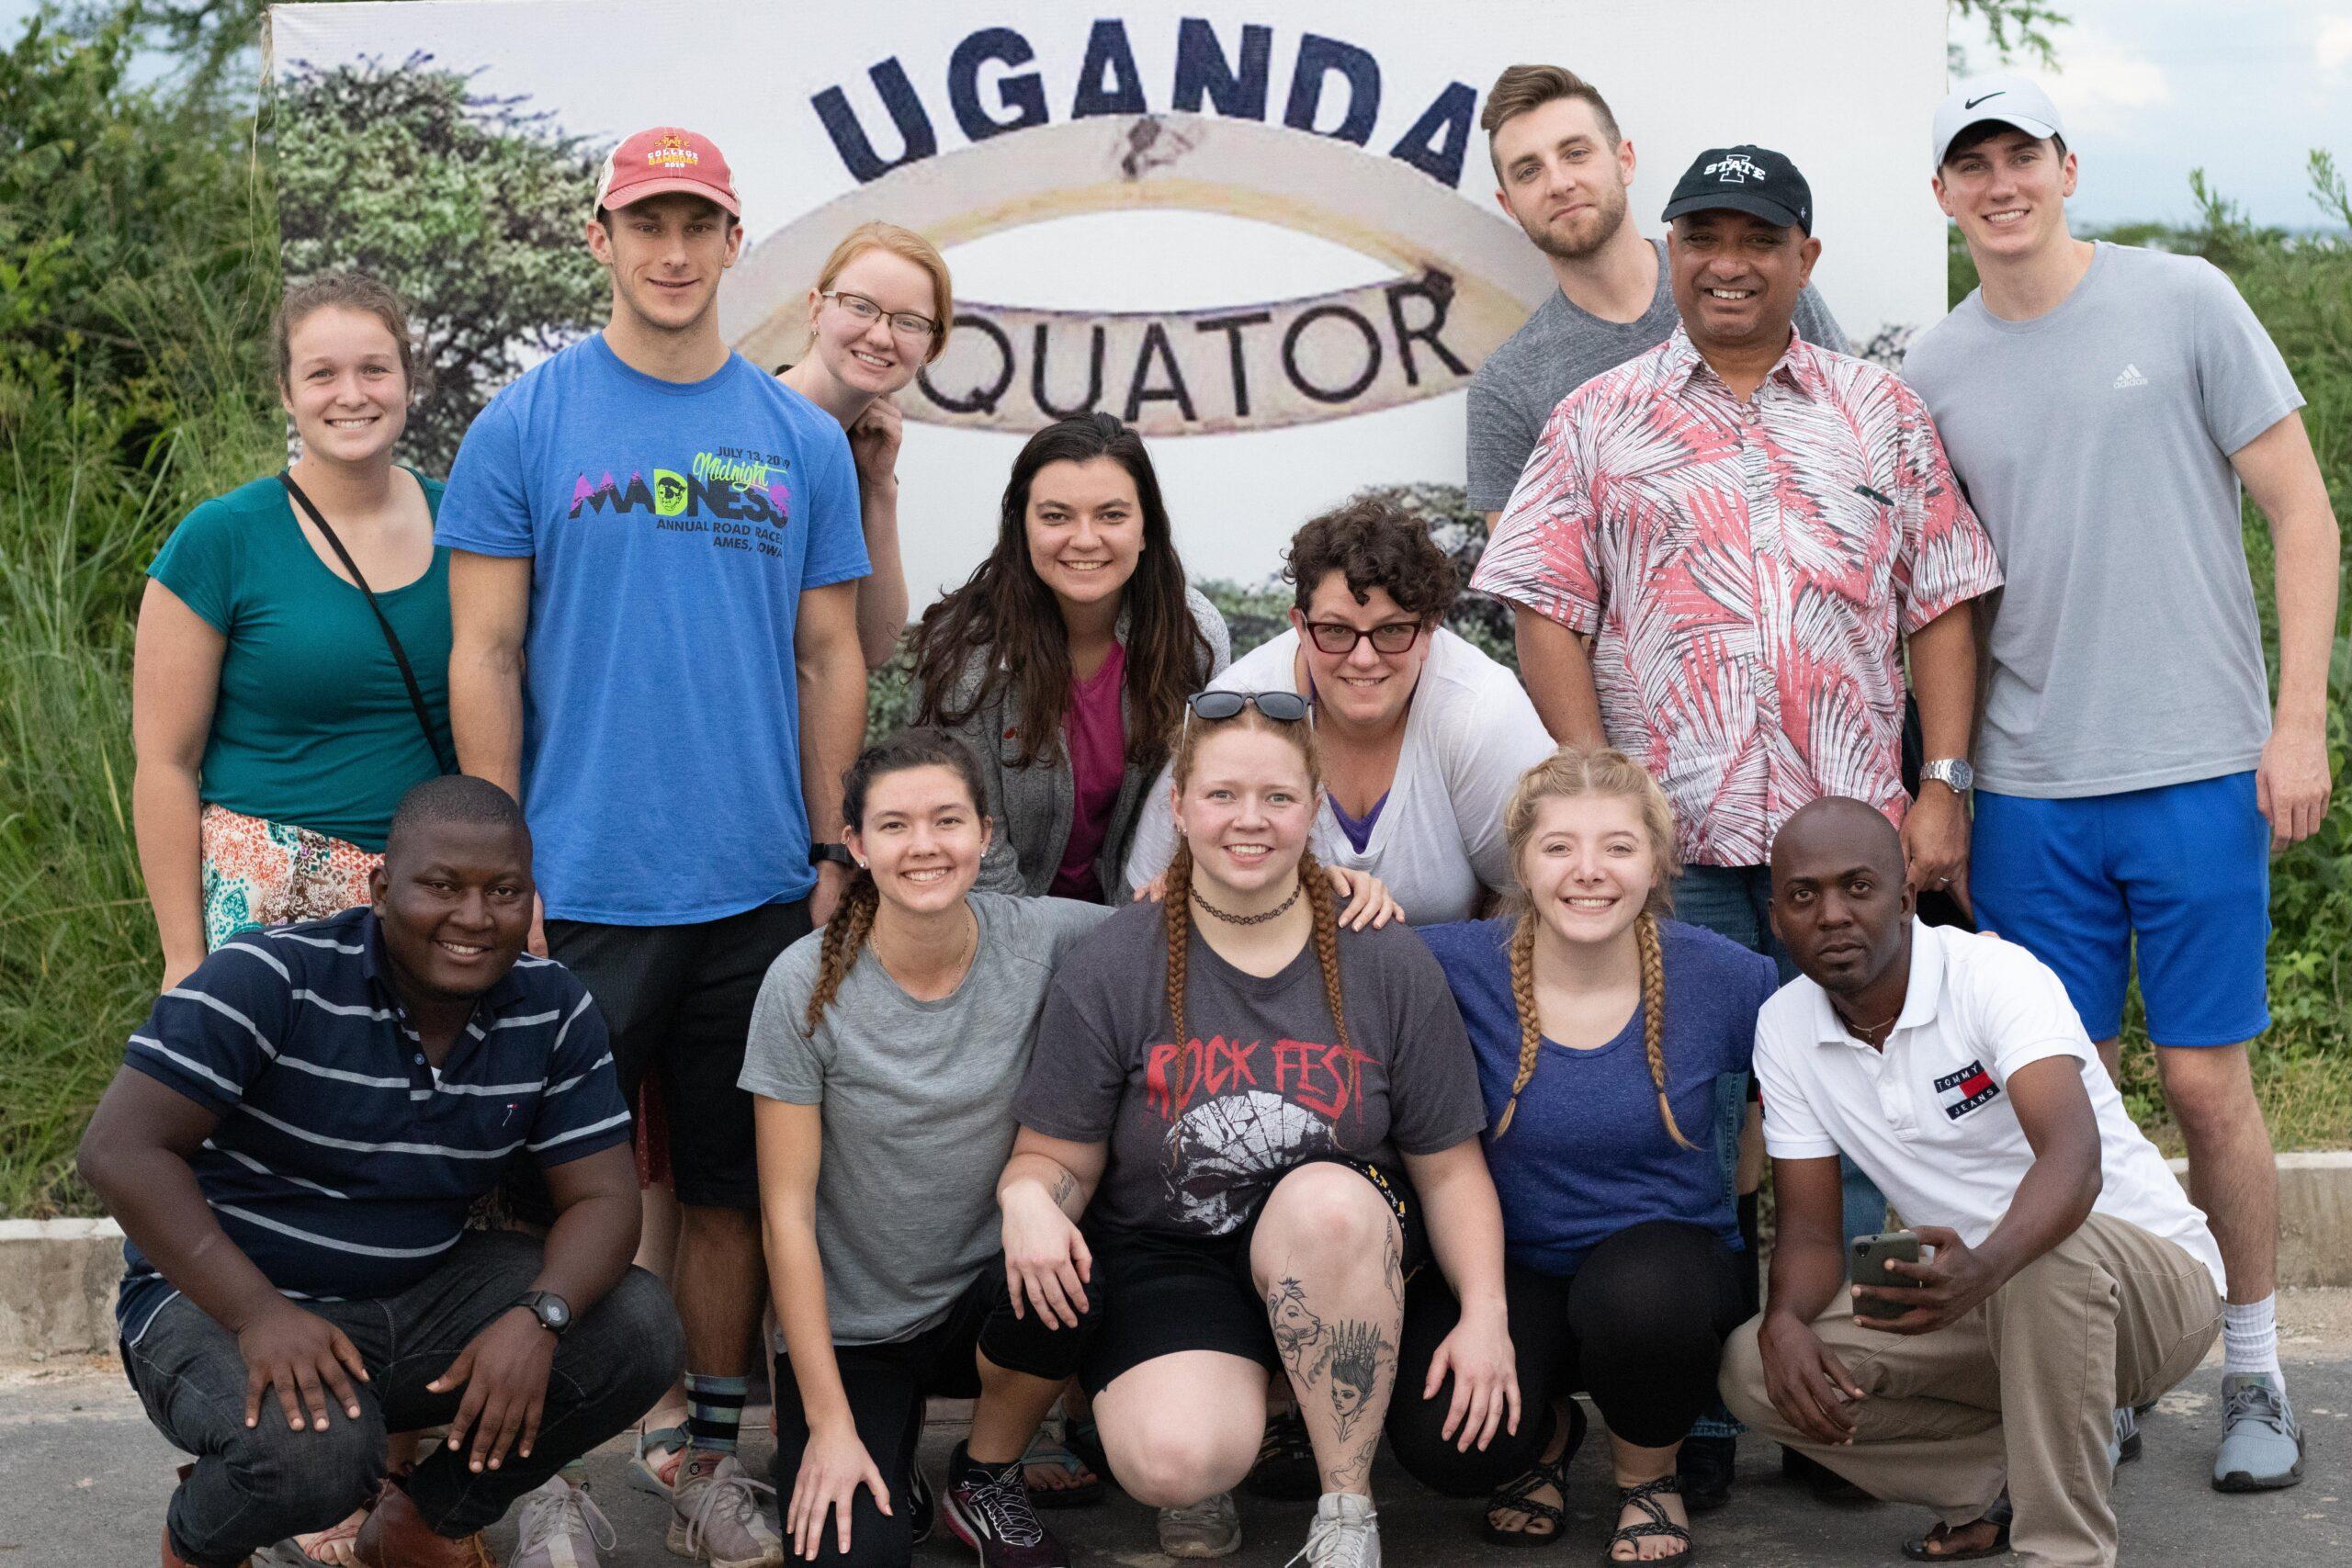 Day 8: [KASESE, UGANDA] KASESE IMPACT ASSESSMENTS | TRAVEL TO KAMPALA